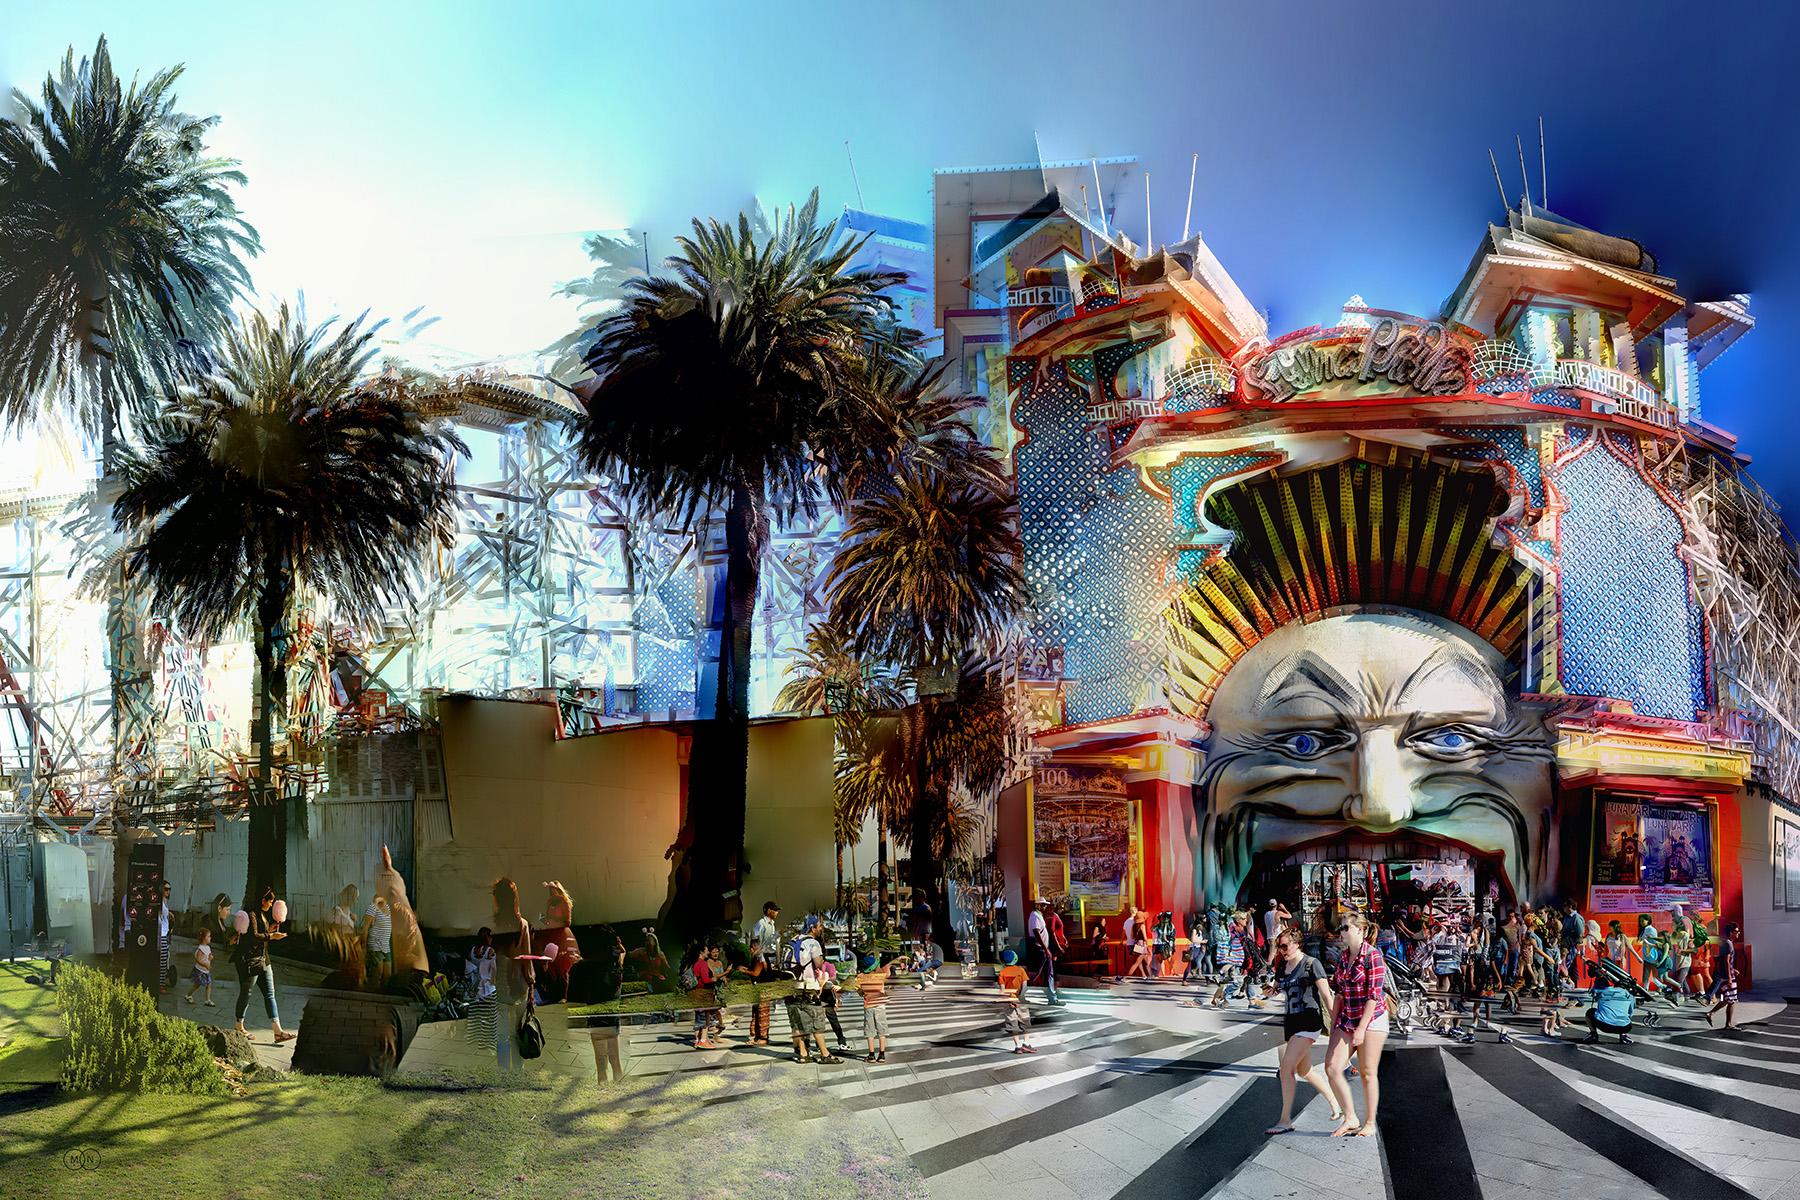 Luna Park - Urb20